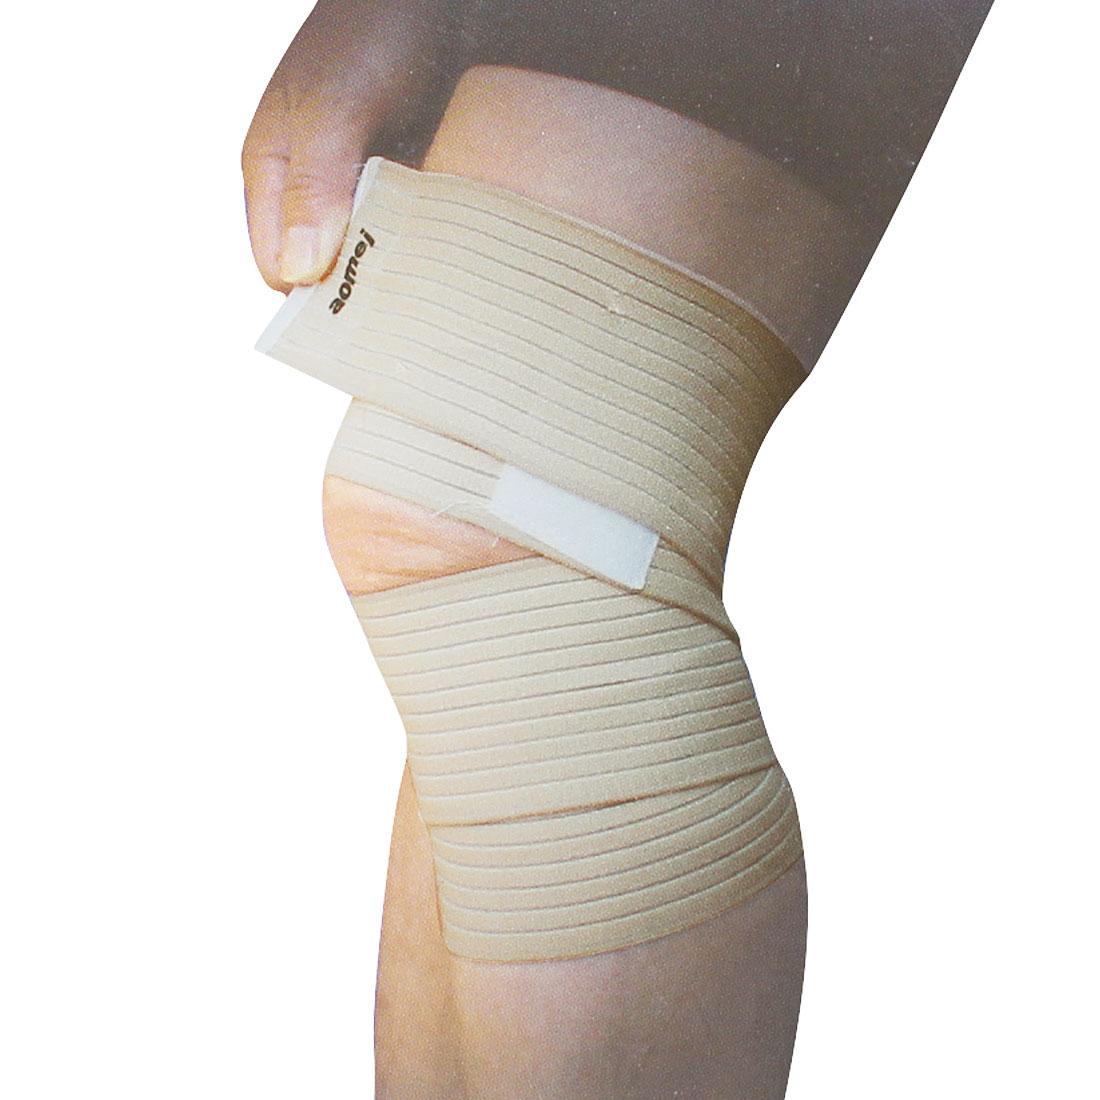 "Football 3"" Wide Elastic Knee Support Bandage Protector Beige"